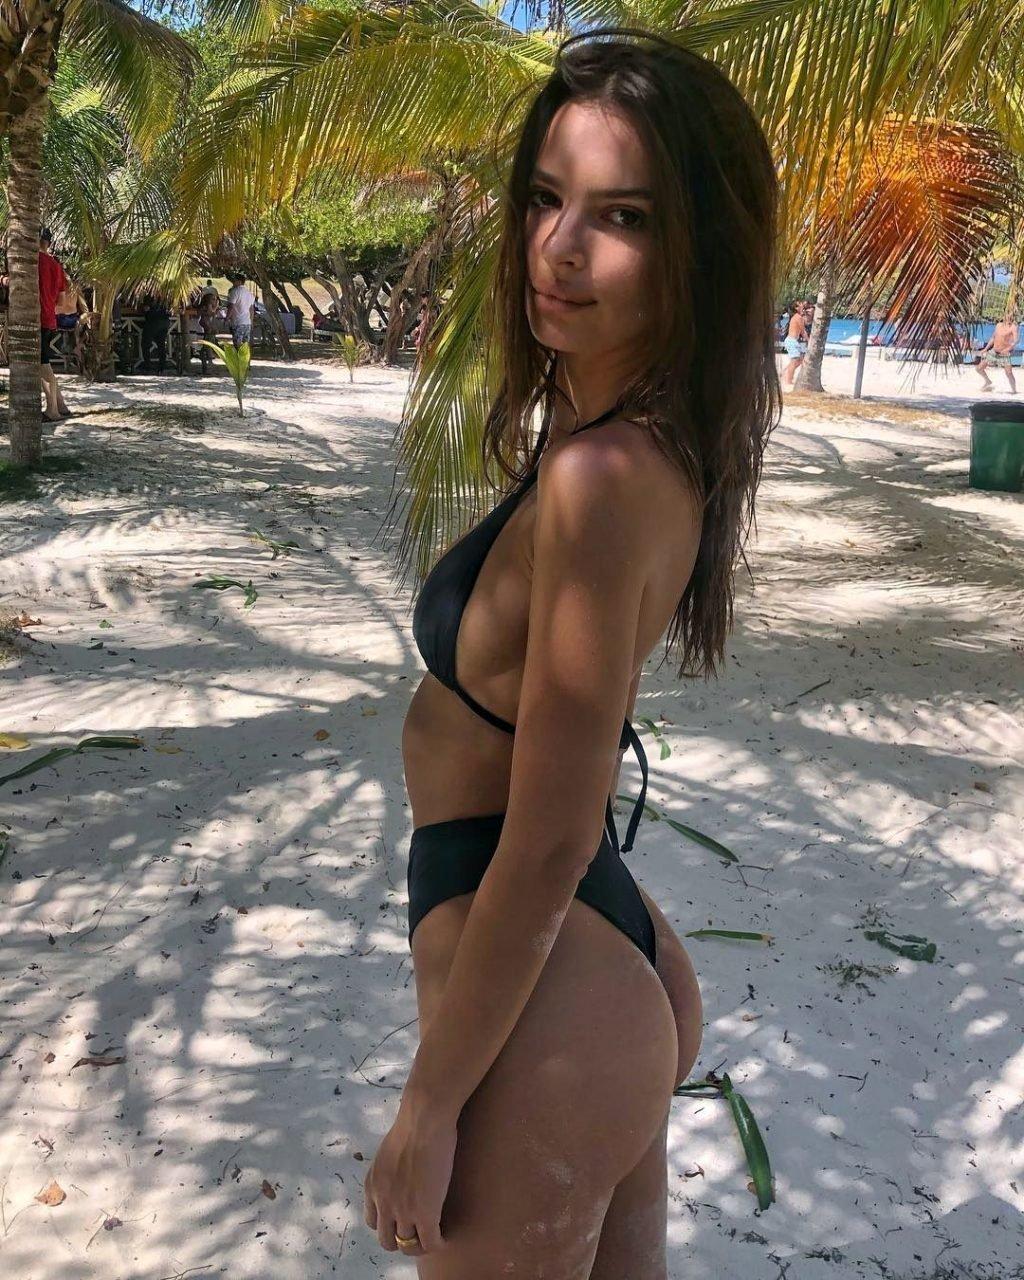 Emily Ratajkowski Hot (2 New Pics)